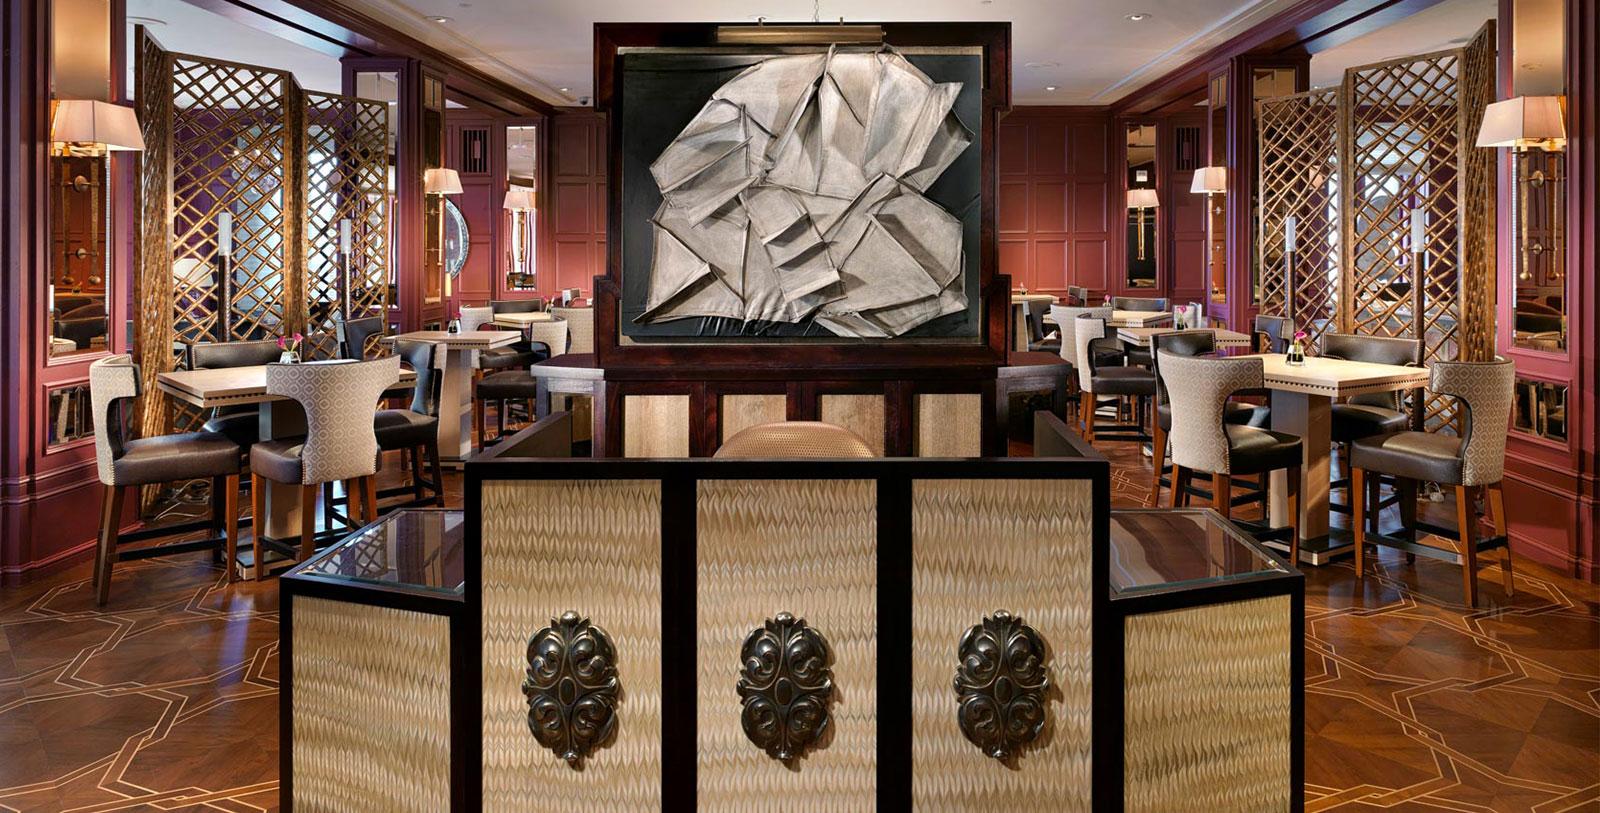 Image of Nob Hill Club, InterContinental Mark Hopkins Hotel in San Francisco, California, 1926, Member of Historic Hotels of America, Dining